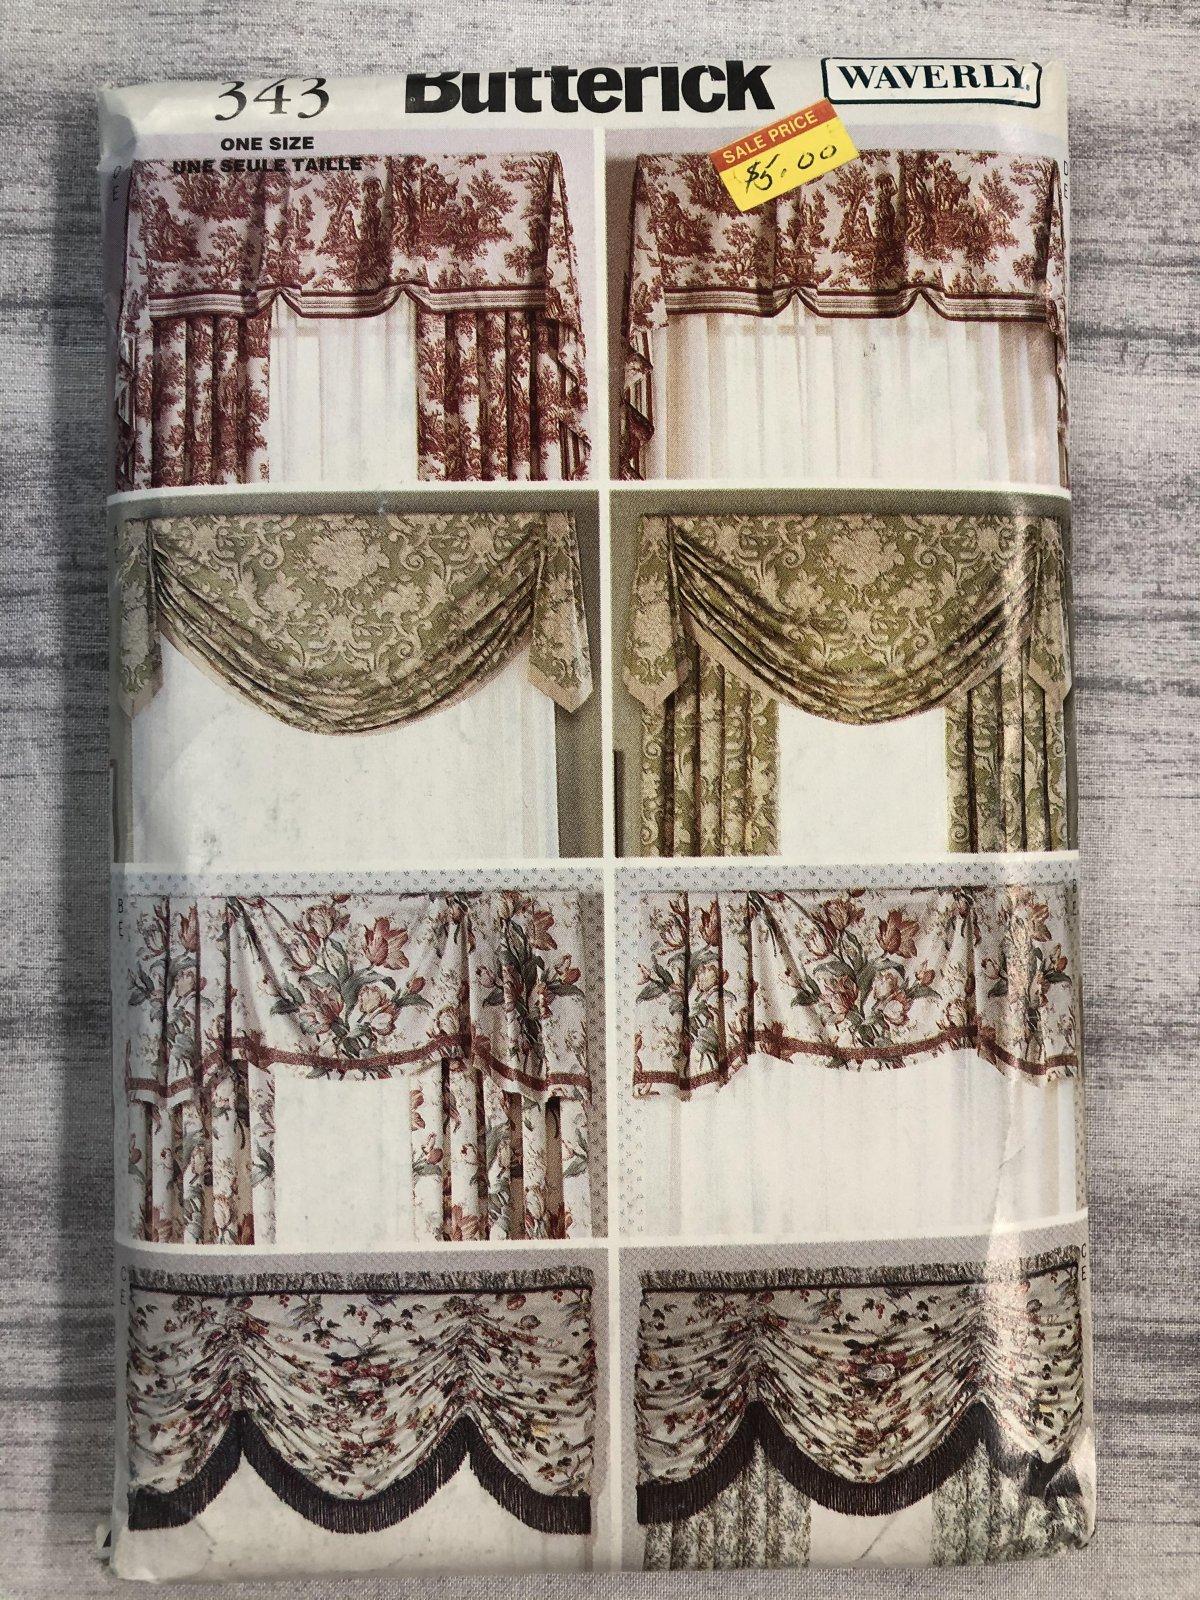 Butterick Waverly Window Treatments 0343